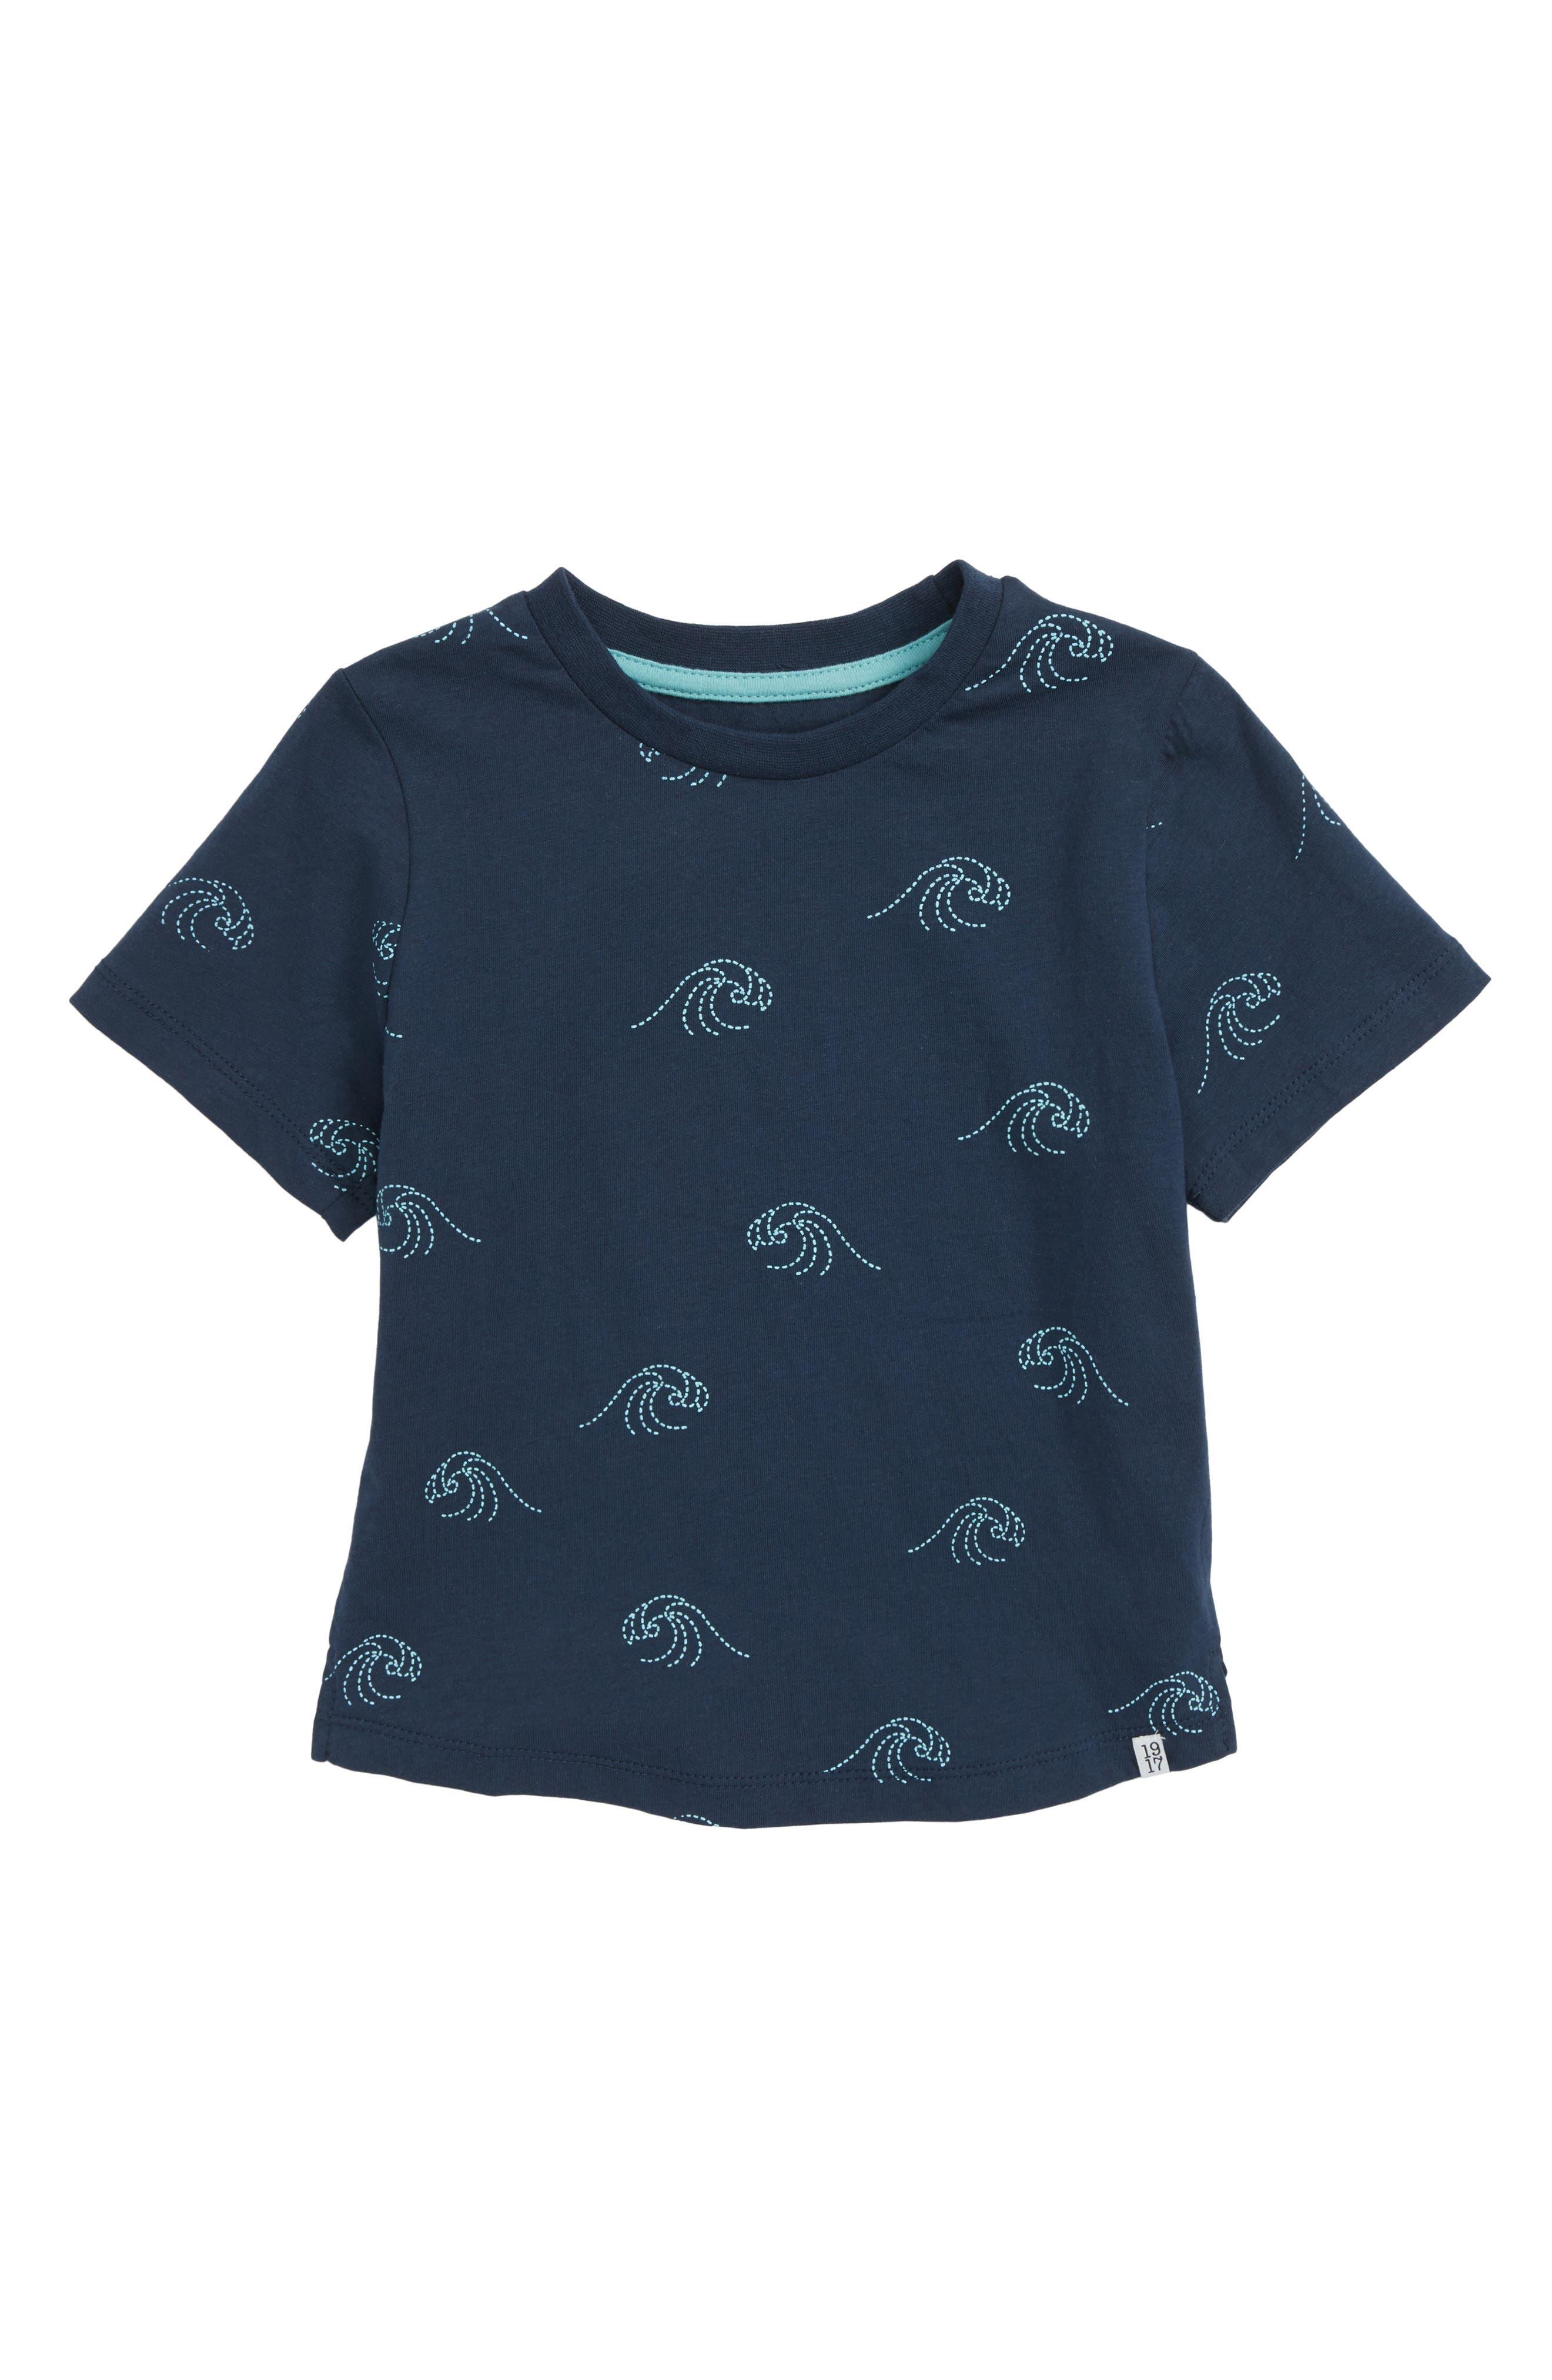 Sovereign Code Feel Embroidered T-Shirt (Toddler Boys & Little Boys)